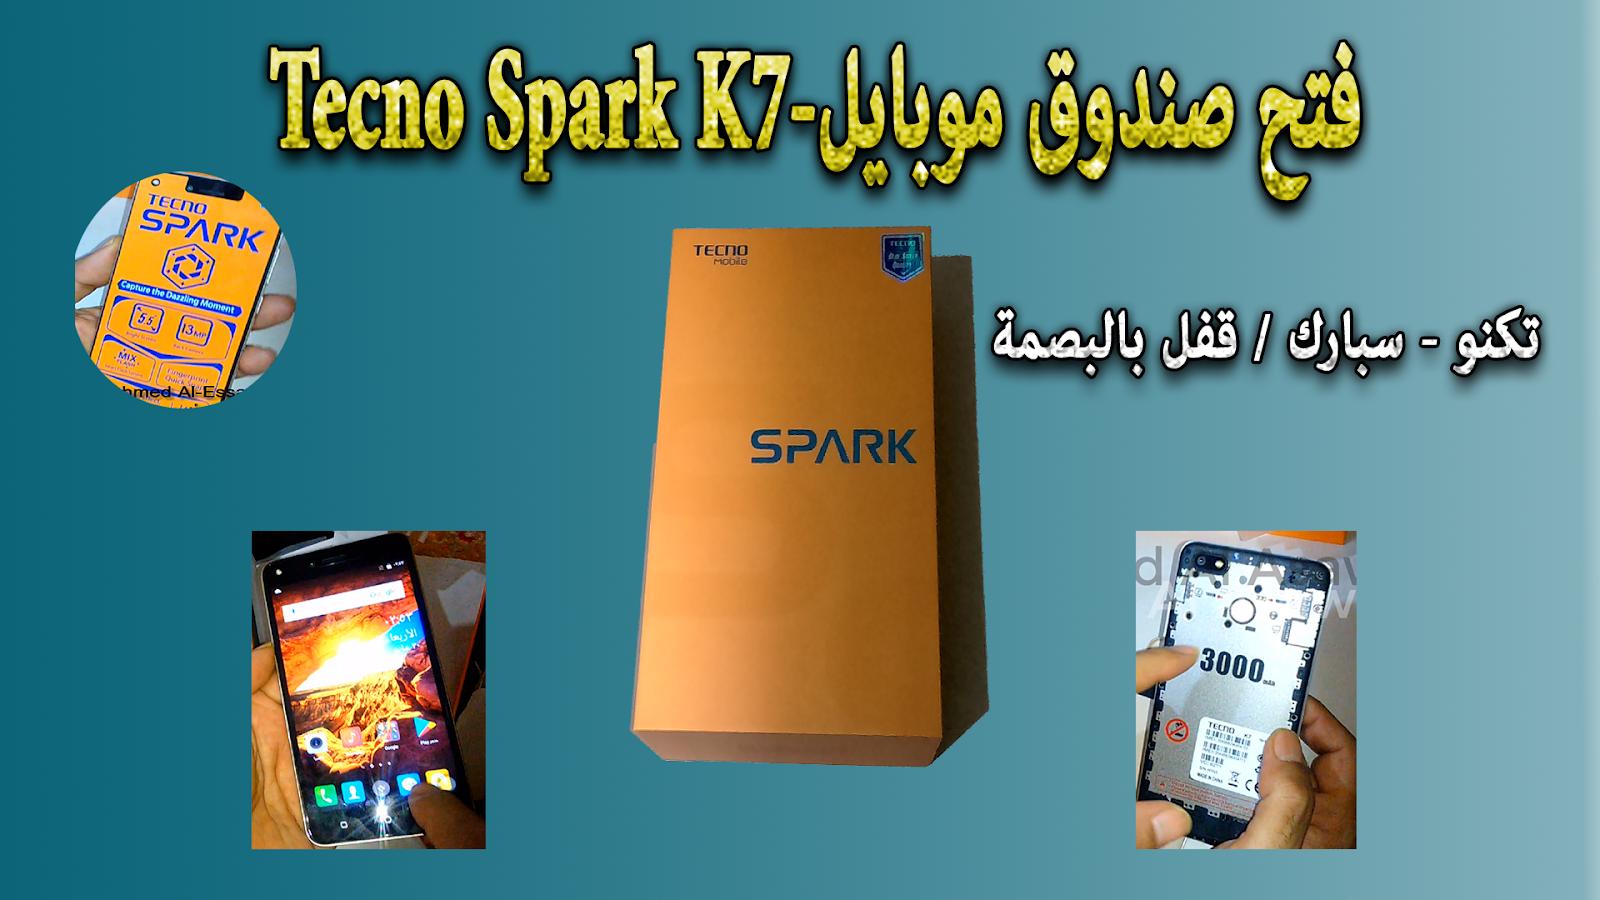 ddd4b8250 فتح صندوق موبايلTecno Spark K7 (تكنو- سبارك) قفل بالبصمة - مدونة ...